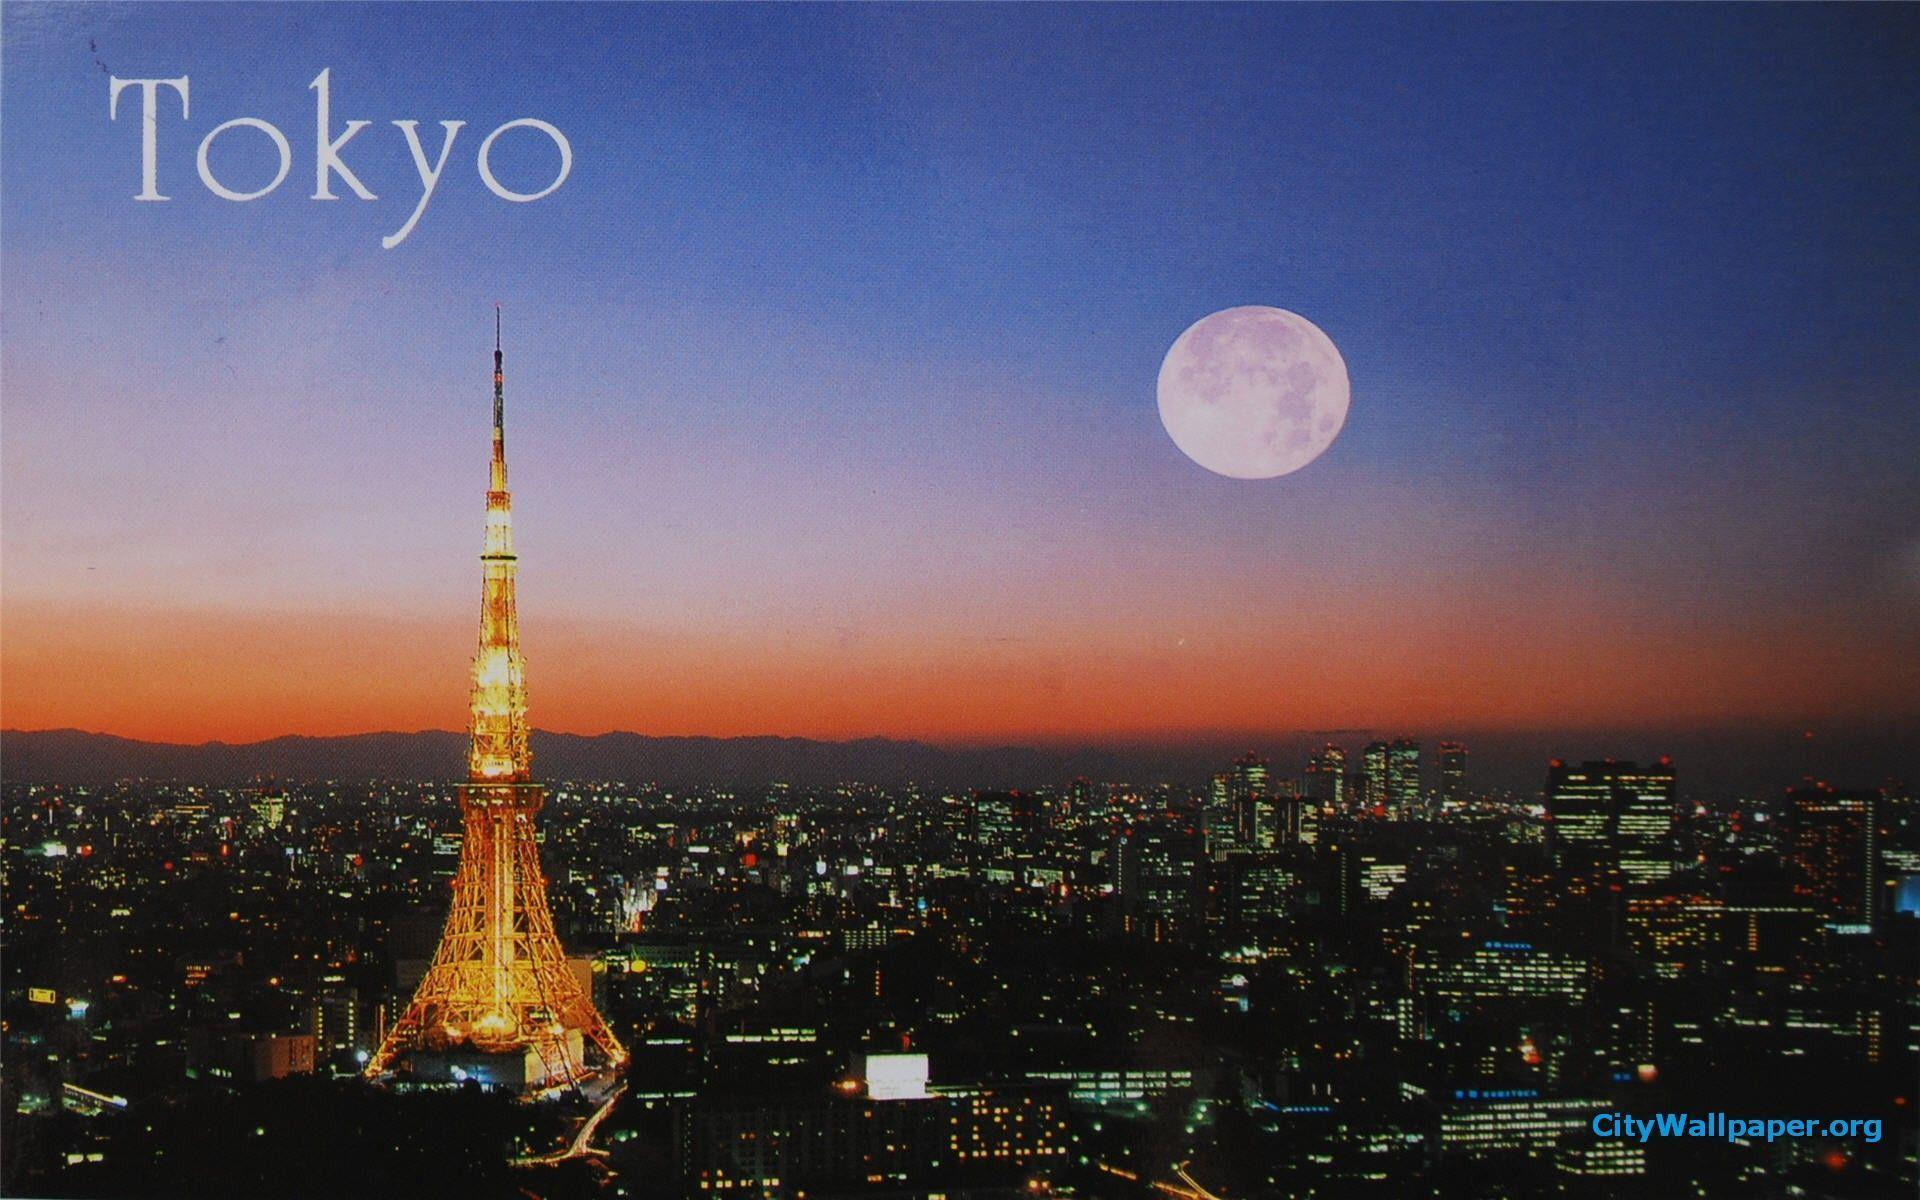 Tokyo wallpaper - 577985